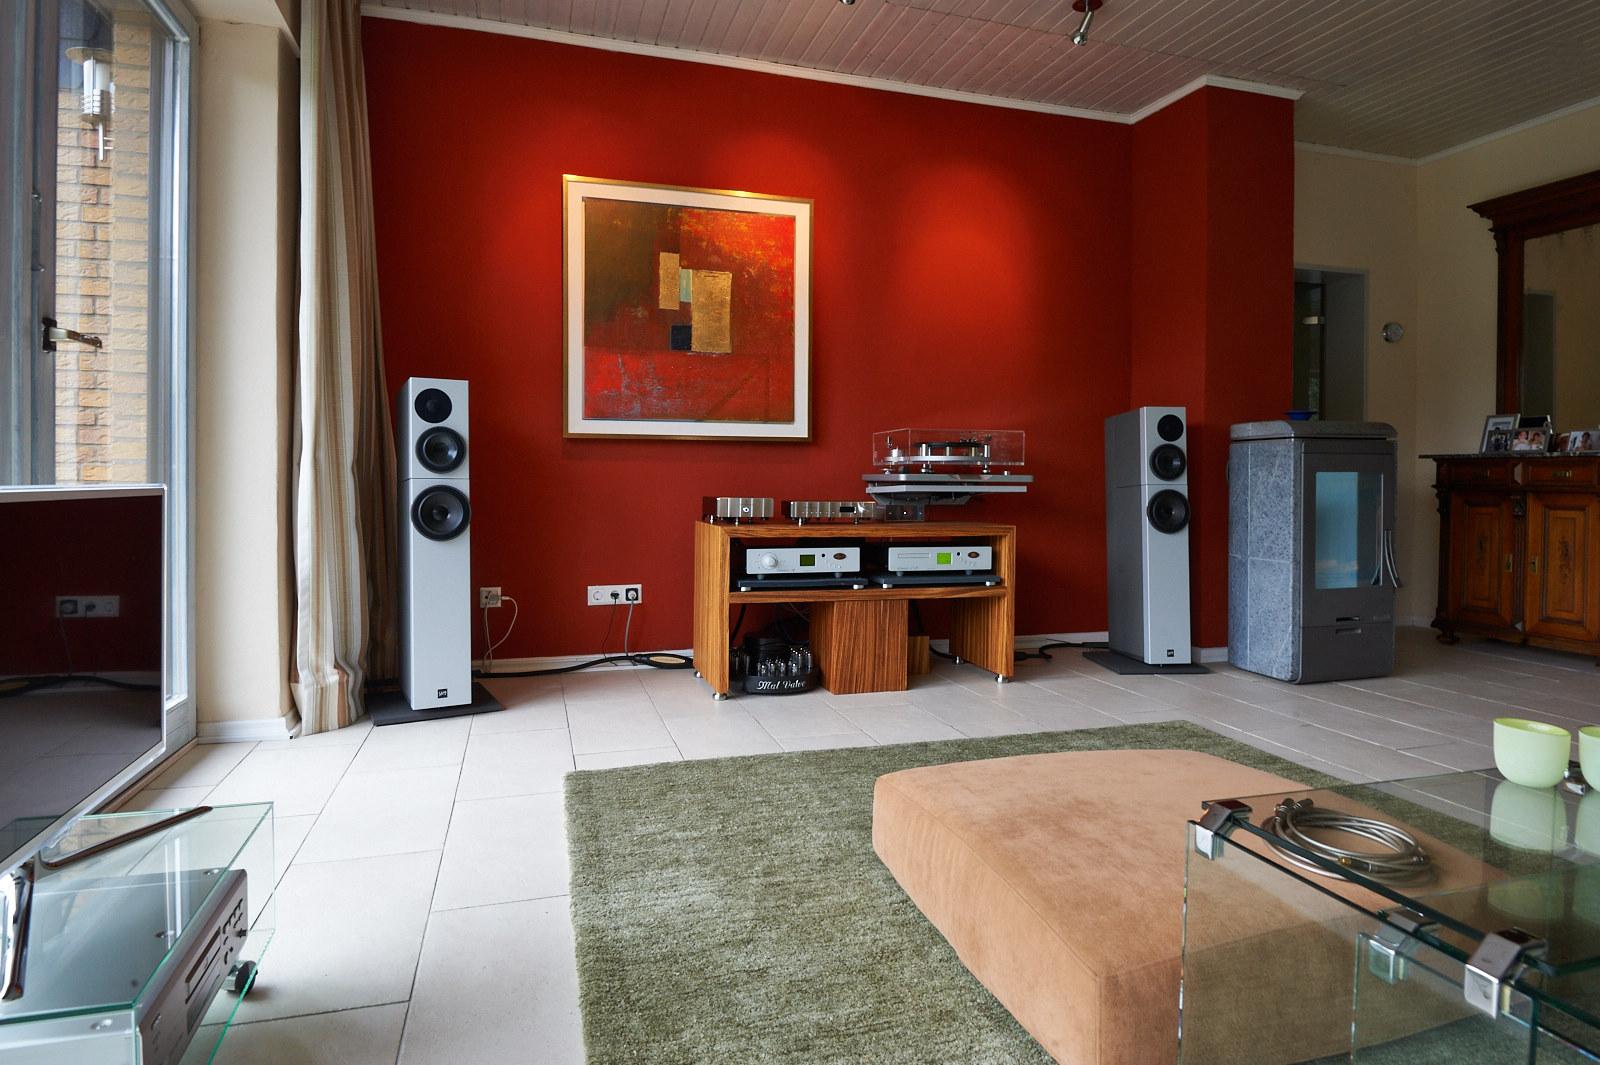 Jeff Rowland Capri S2 - Jeff Rowland M525 - Sehring Audio Systeme S704SE